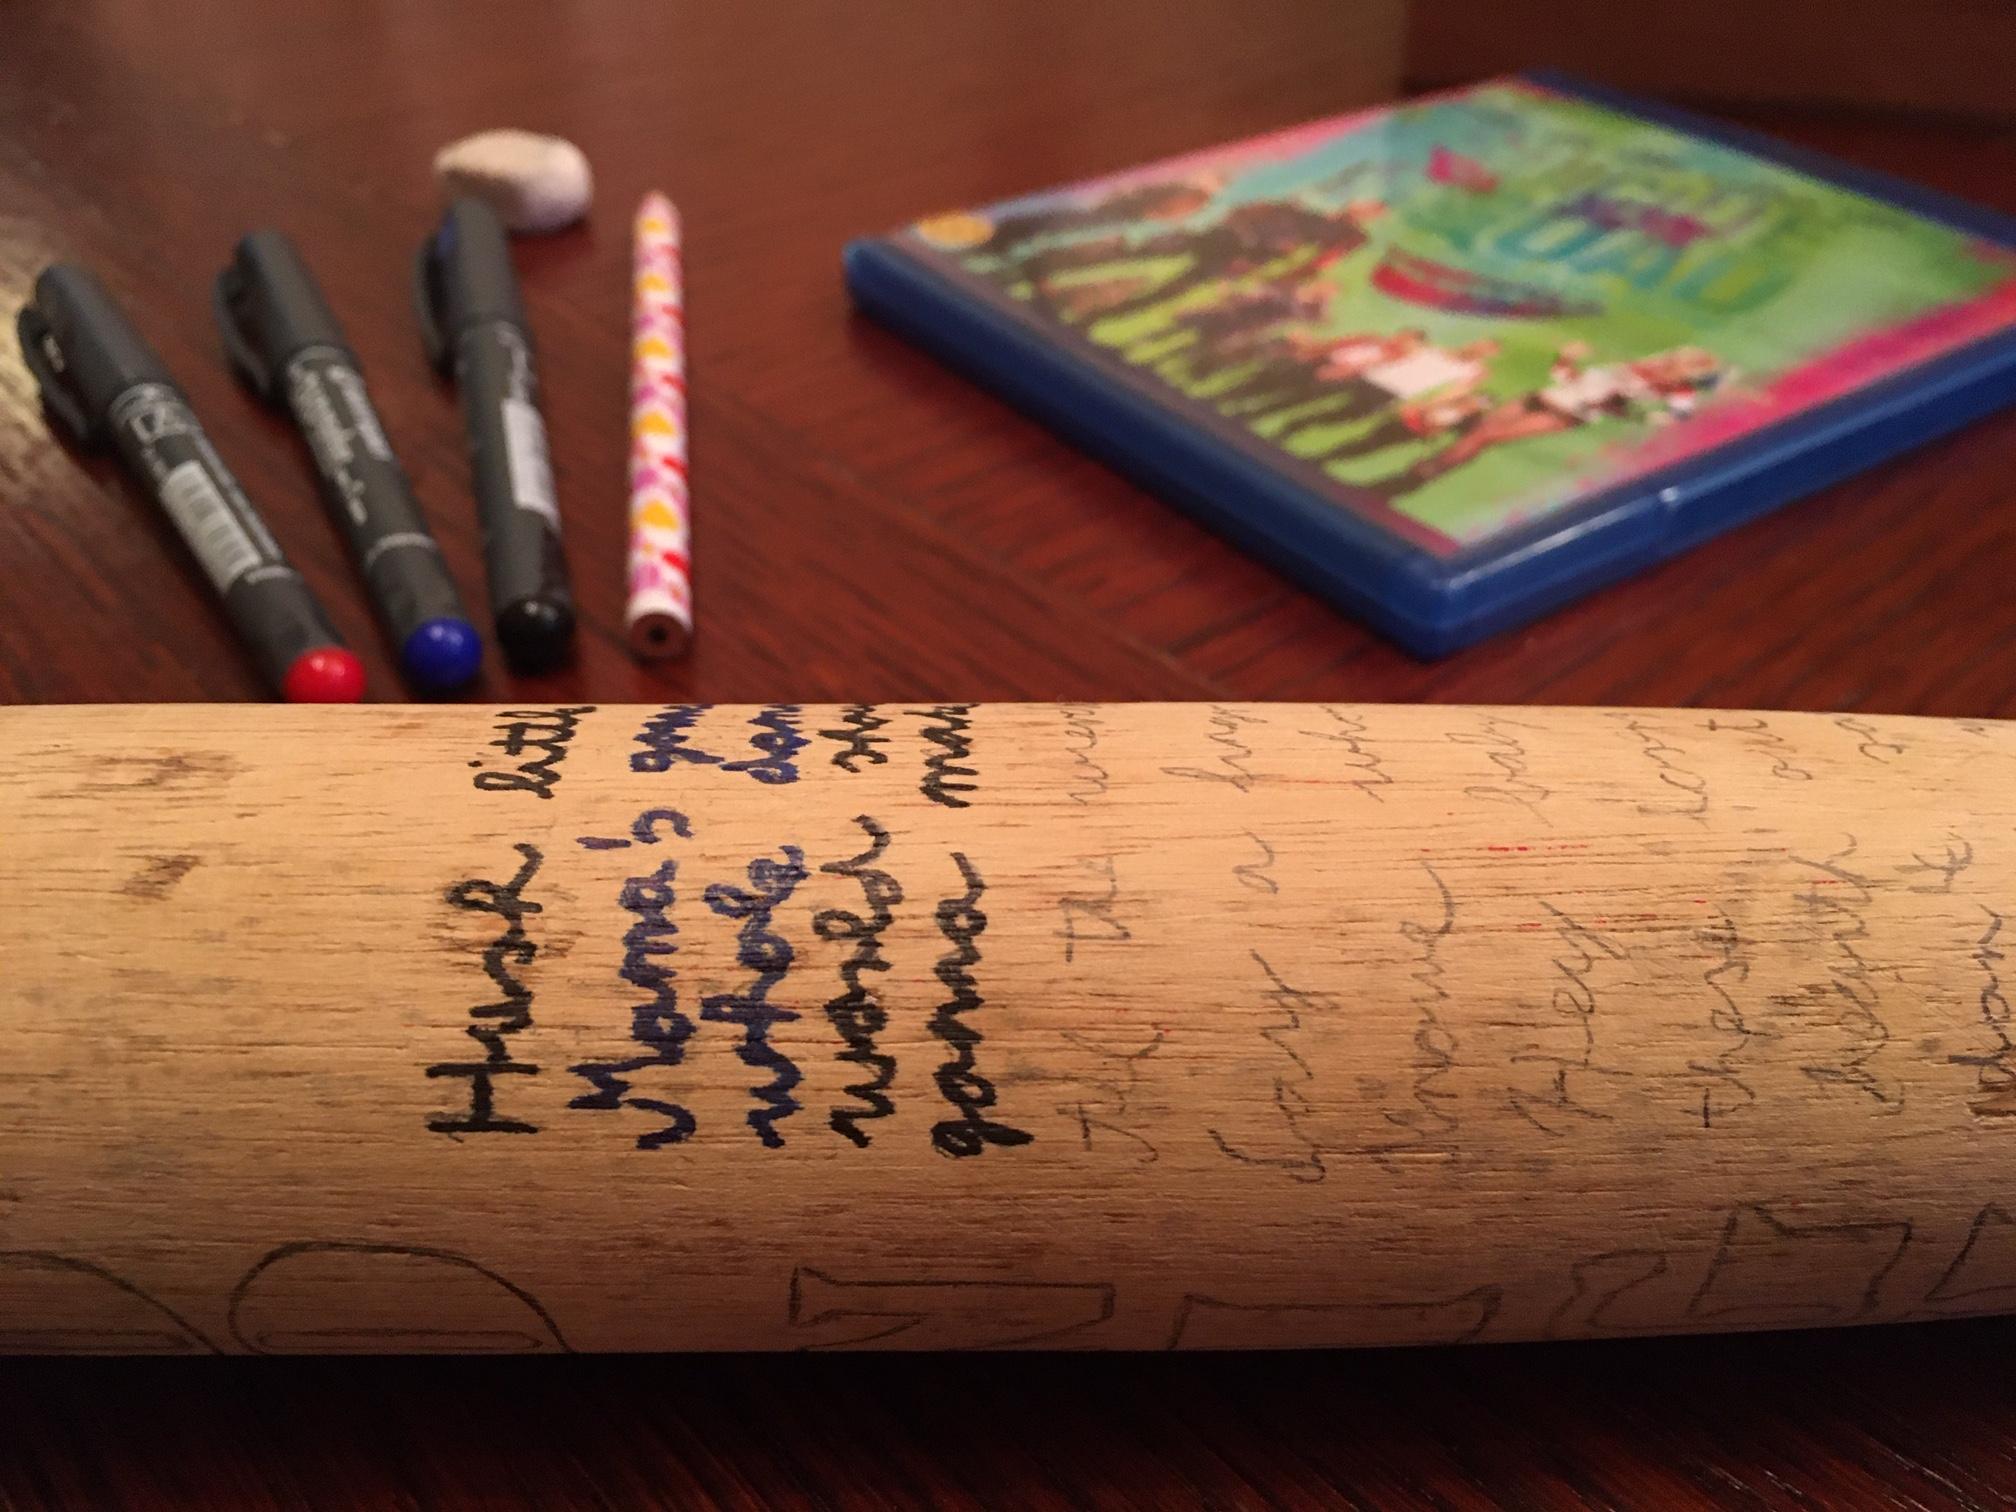 szmk_diy_harley_quinn_baseball_uto_dc_bat_gotham_batman_joker_do_it_your_slef_csinald_magad_7.JPG